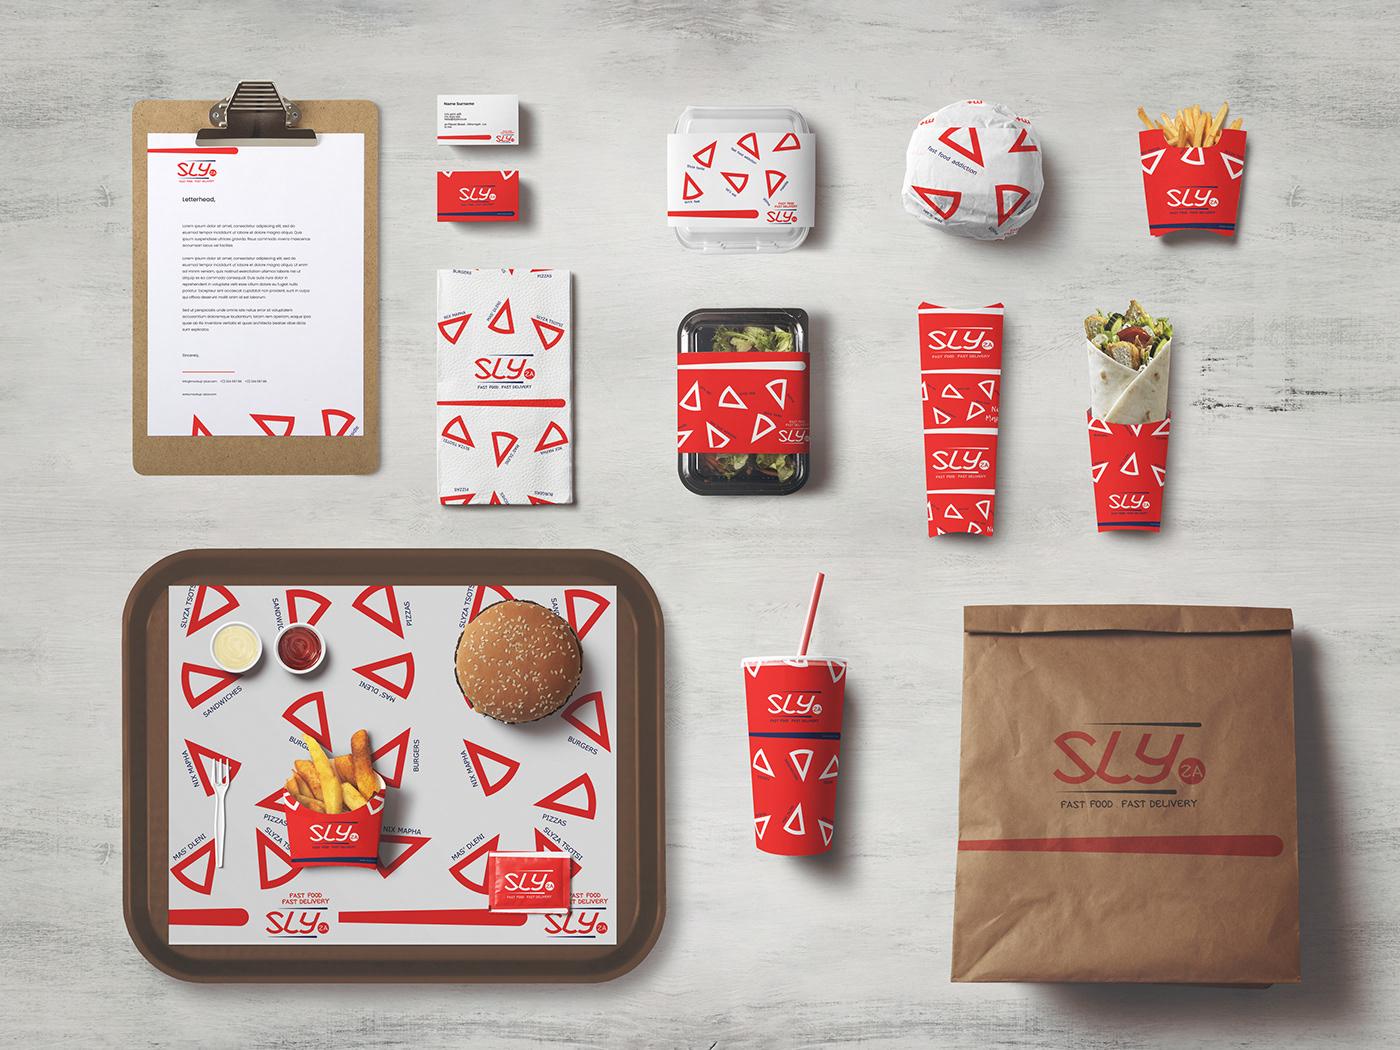 Identity Design pantsula restaurant brand sandwich brand Typographic Logo red and white brand fast food brand food brand food truck brand pizza brand